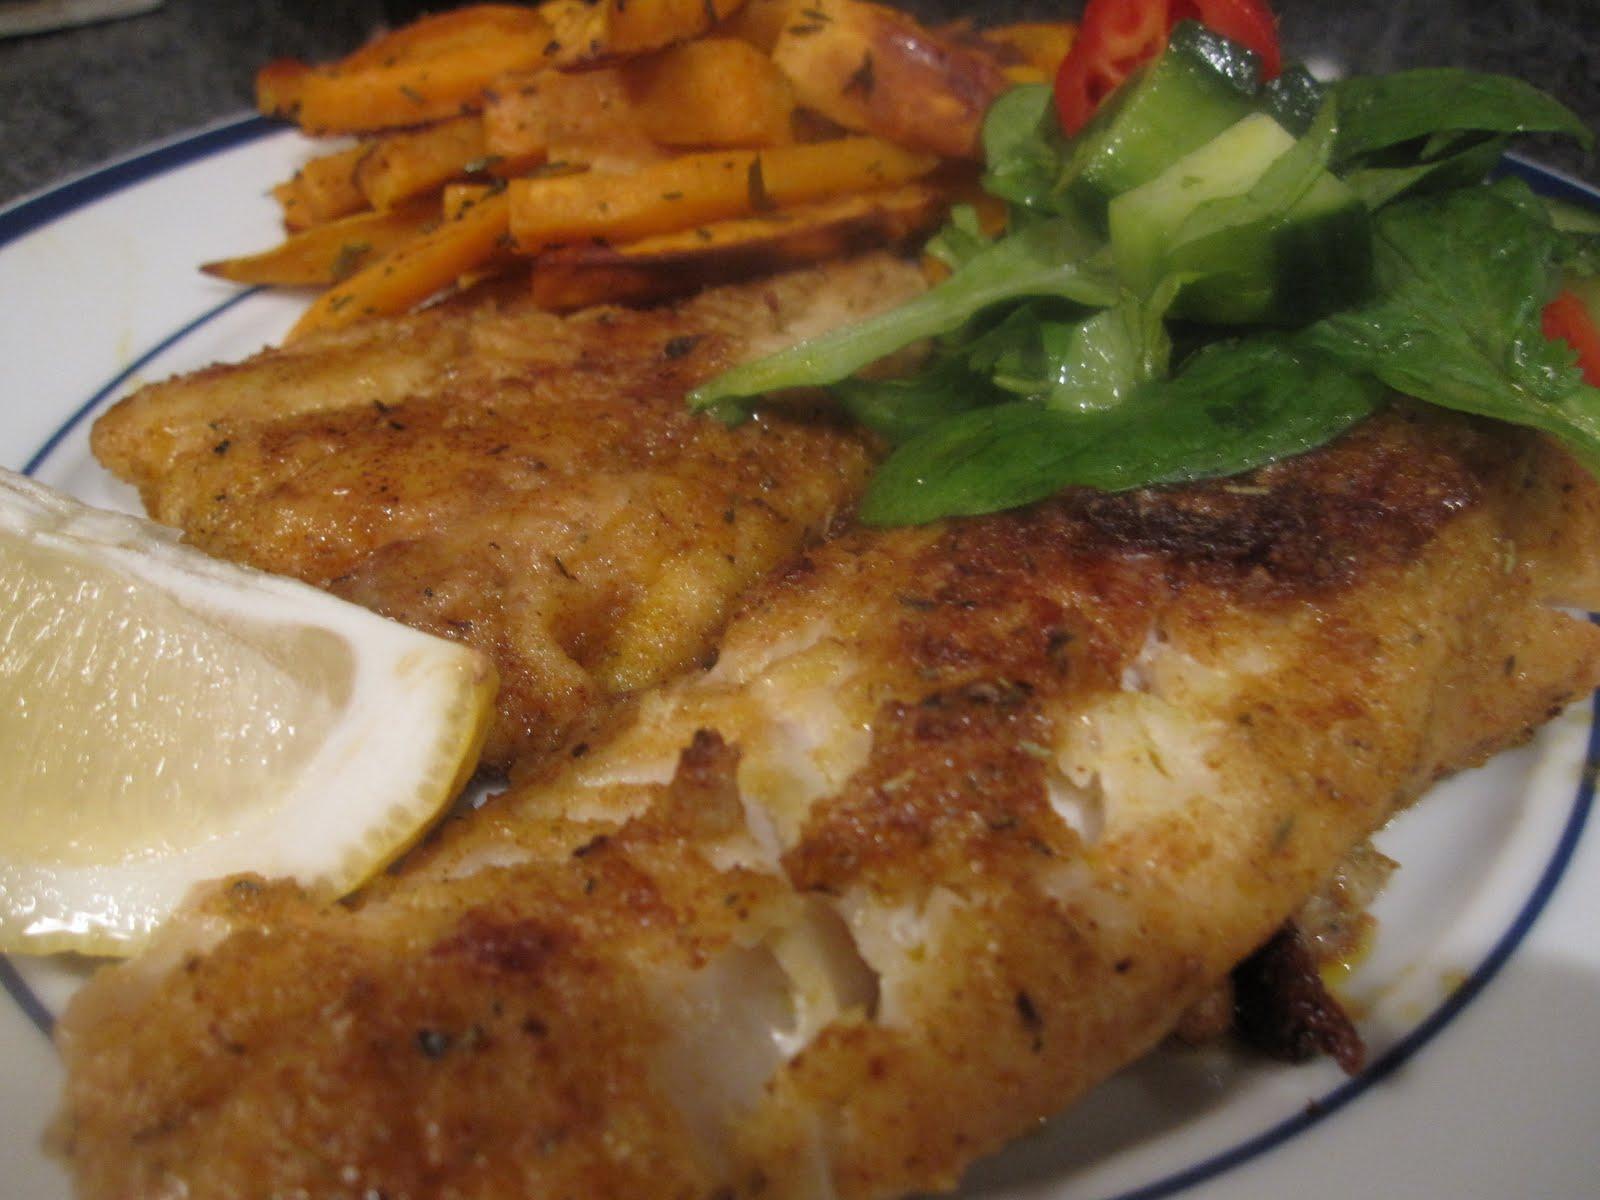 Fried fish recipe haddock for Fried fish recipes